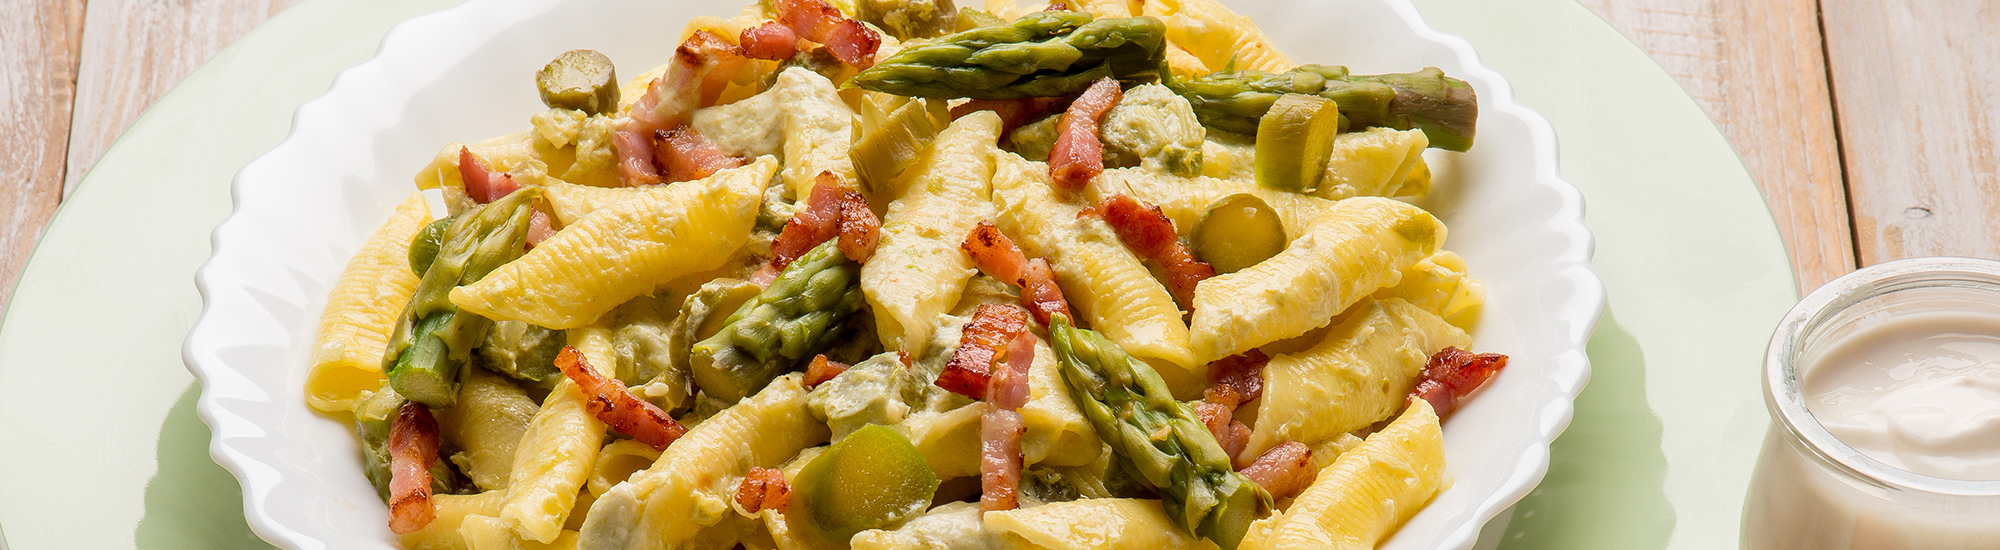 ricetta Garganelli con asparagi, panna e speck con pasta fresca